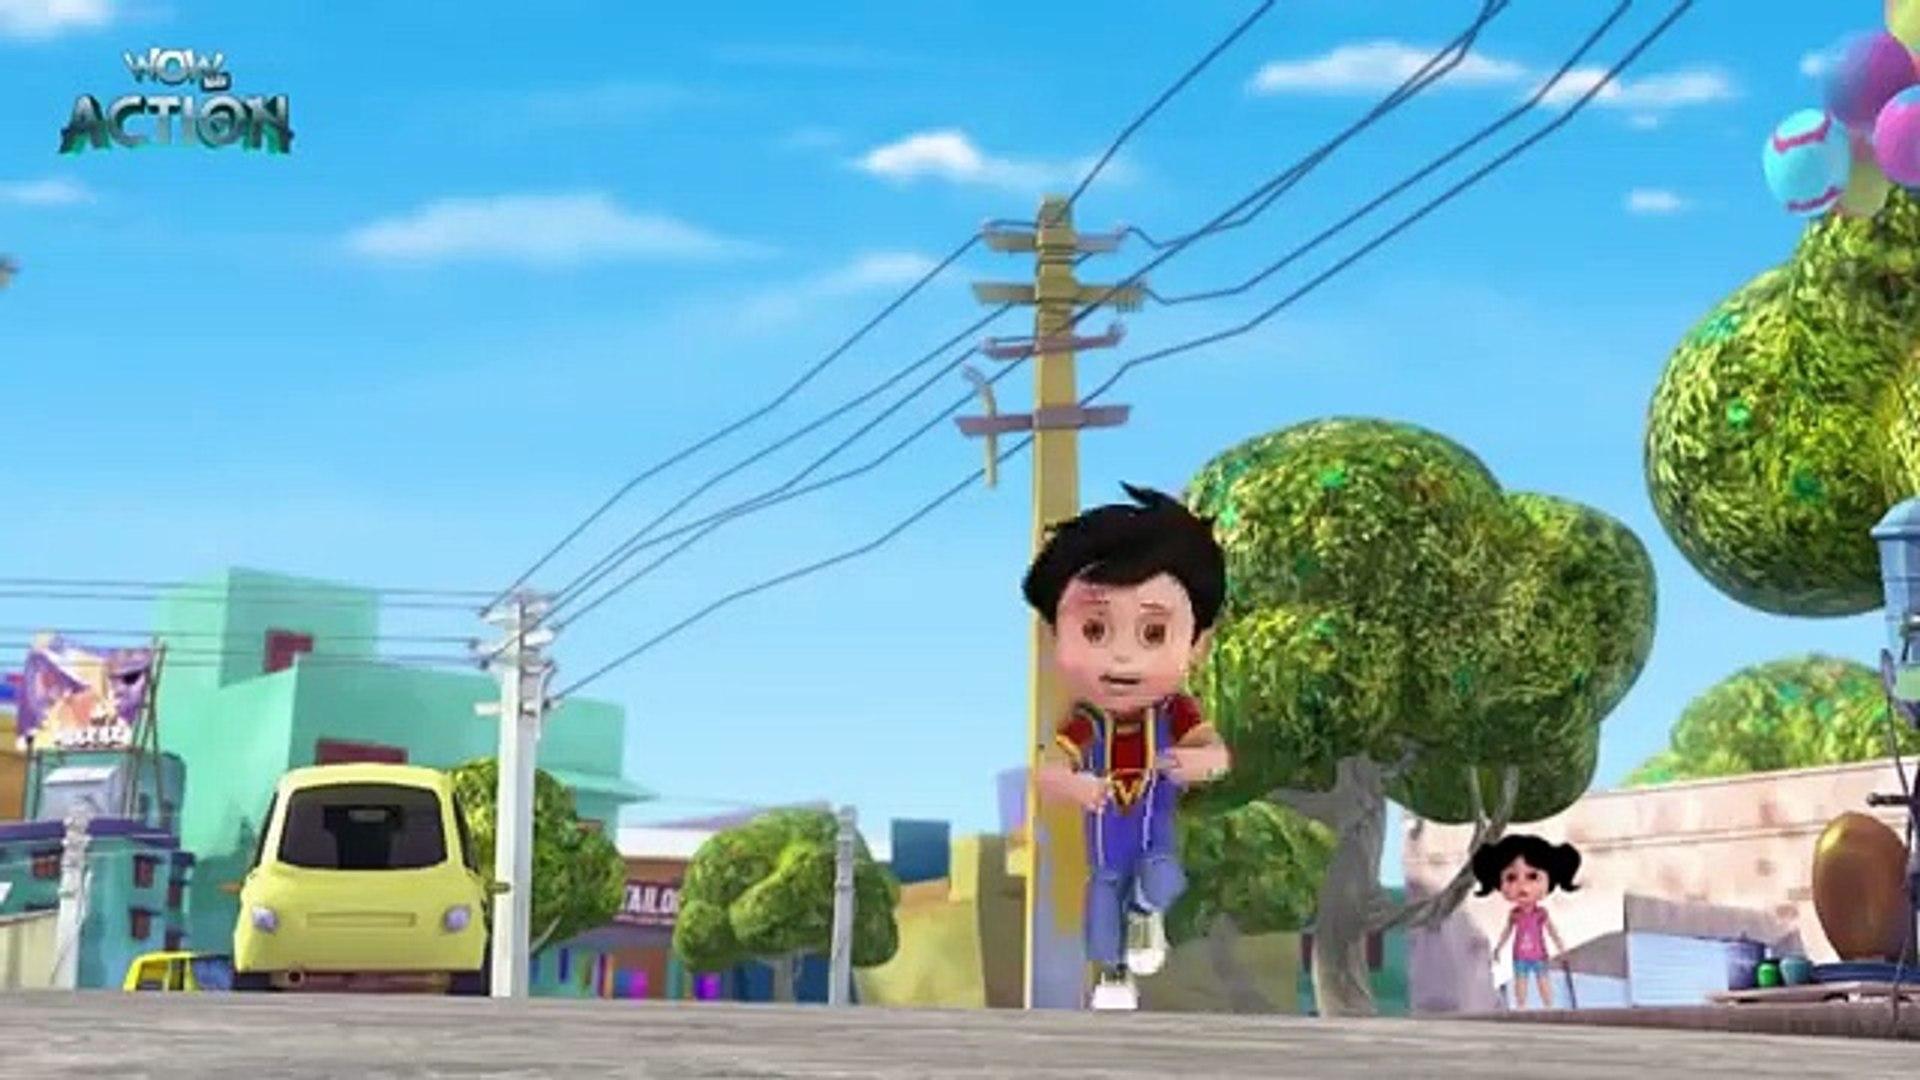 VIR THE ROBOT BOY - Animated Series For Kids - #30